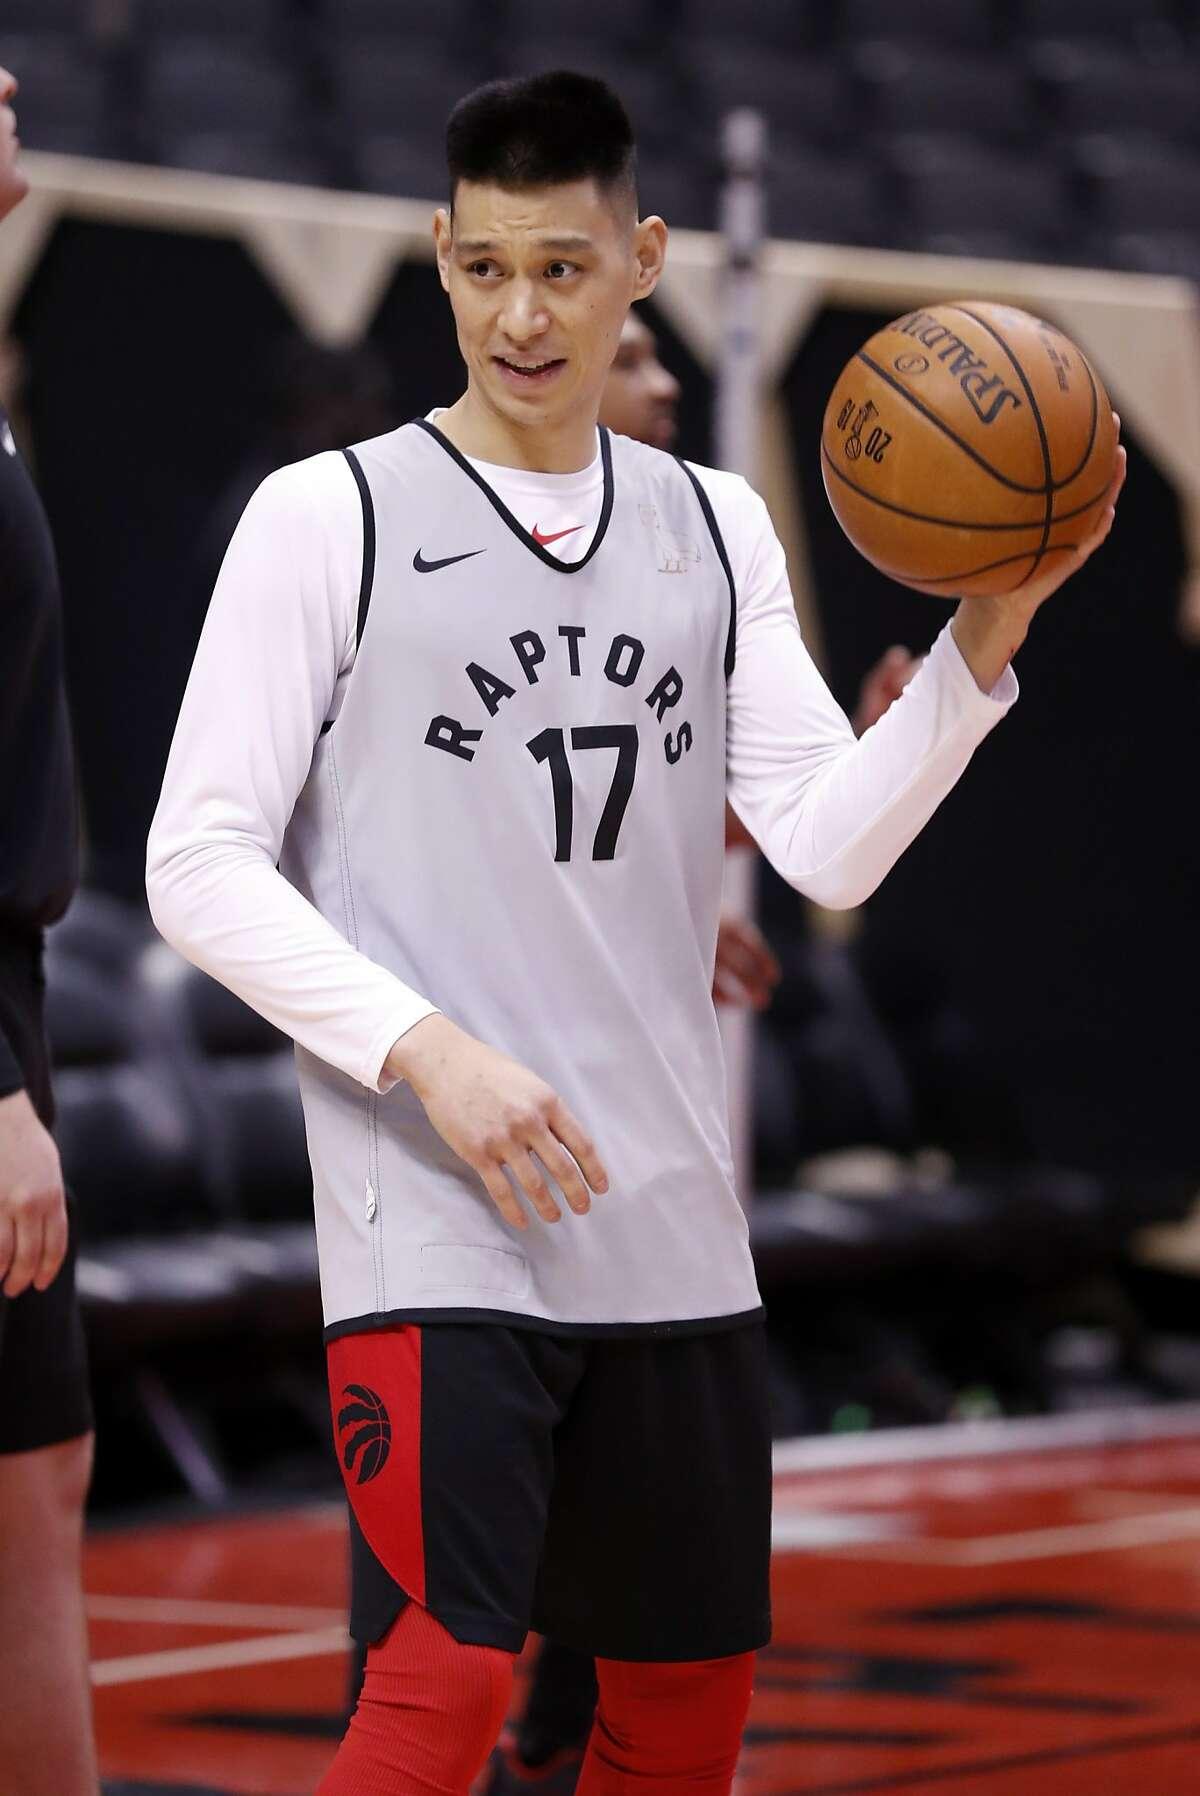 Toronto Raptors' Jeremy Lin during NBA Finals' practice at ScotiaBank Arena in Toronto, Ontario, Canada, on Saturday, June 1, 2019.